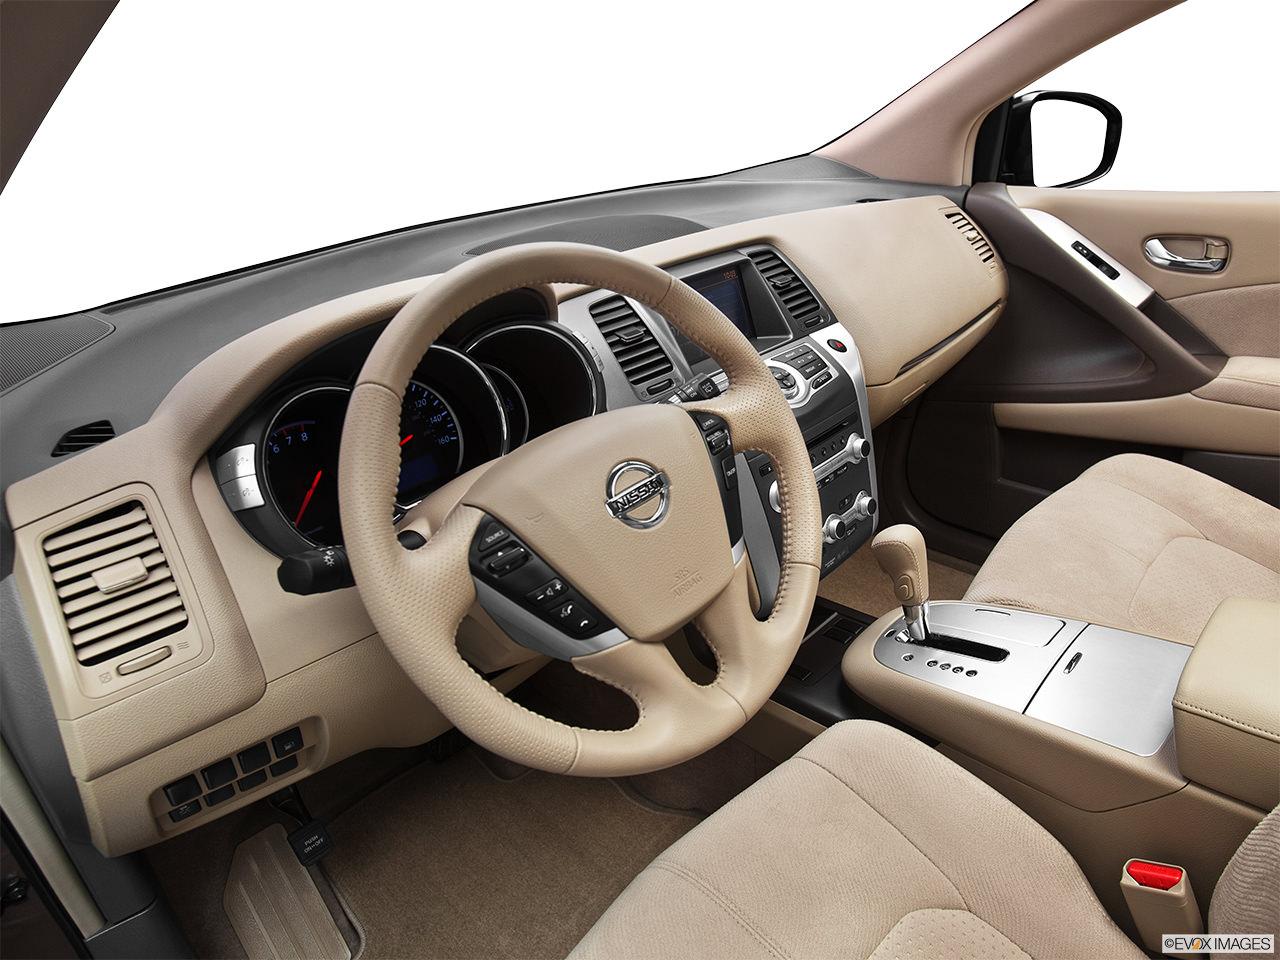 Nissan Murano 2012 Interior